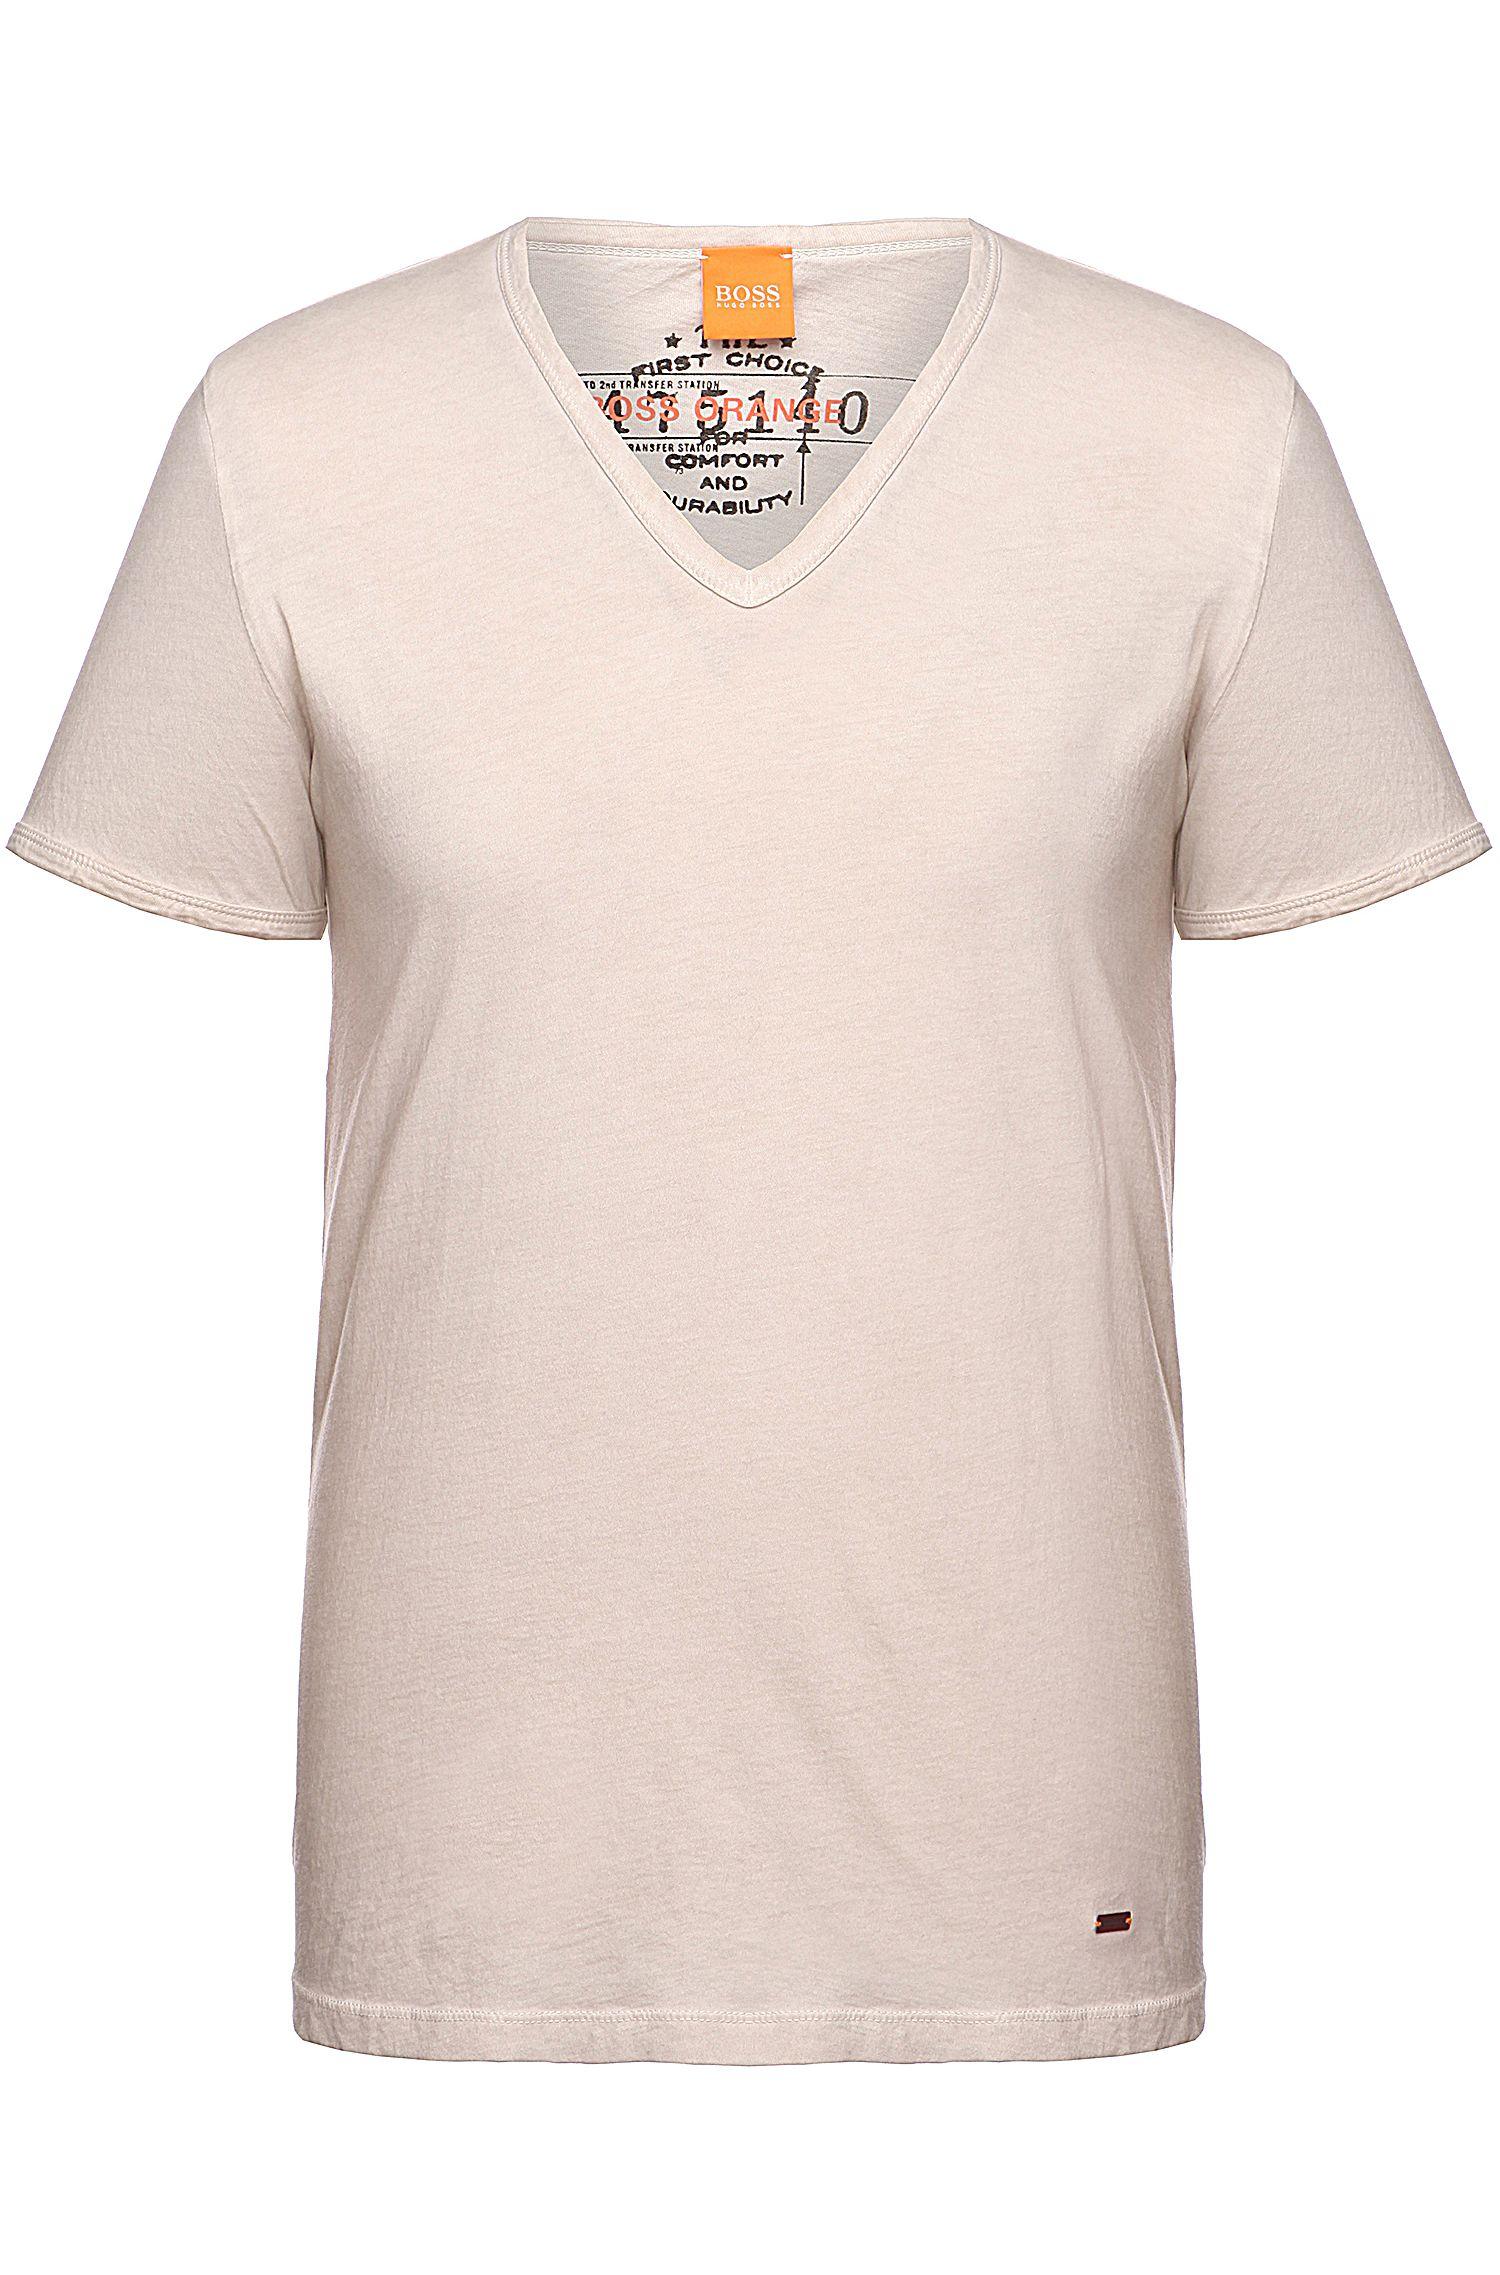 T-shirt Regular Fit en coton garment dyed